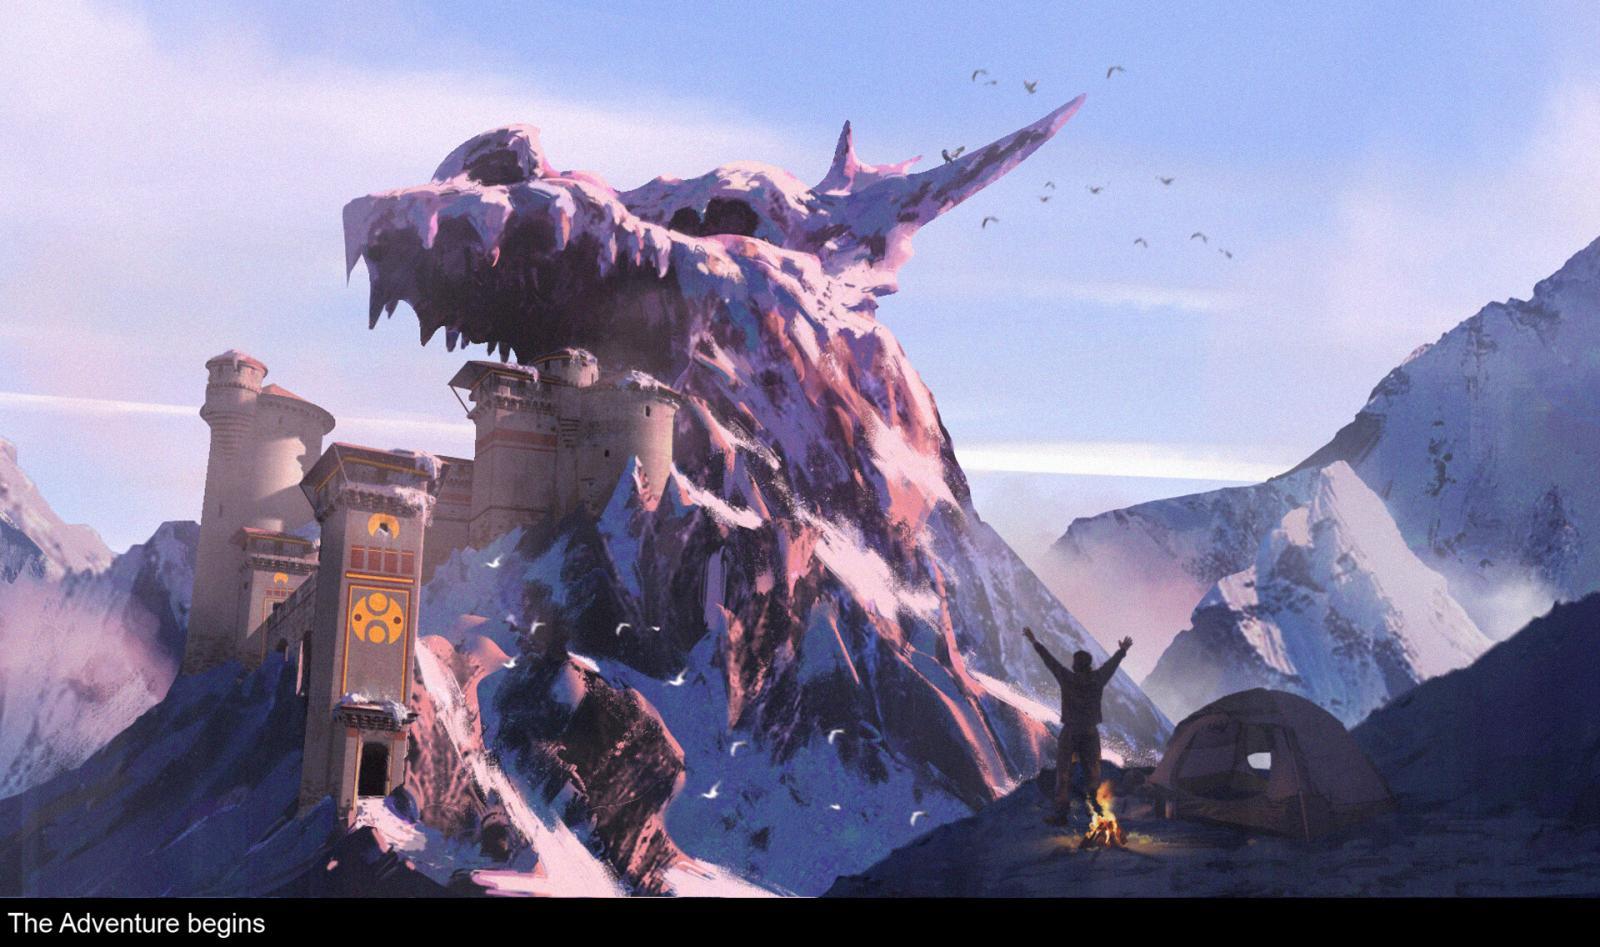 lim-joshua-dragon-monastery-final-painting.jpg